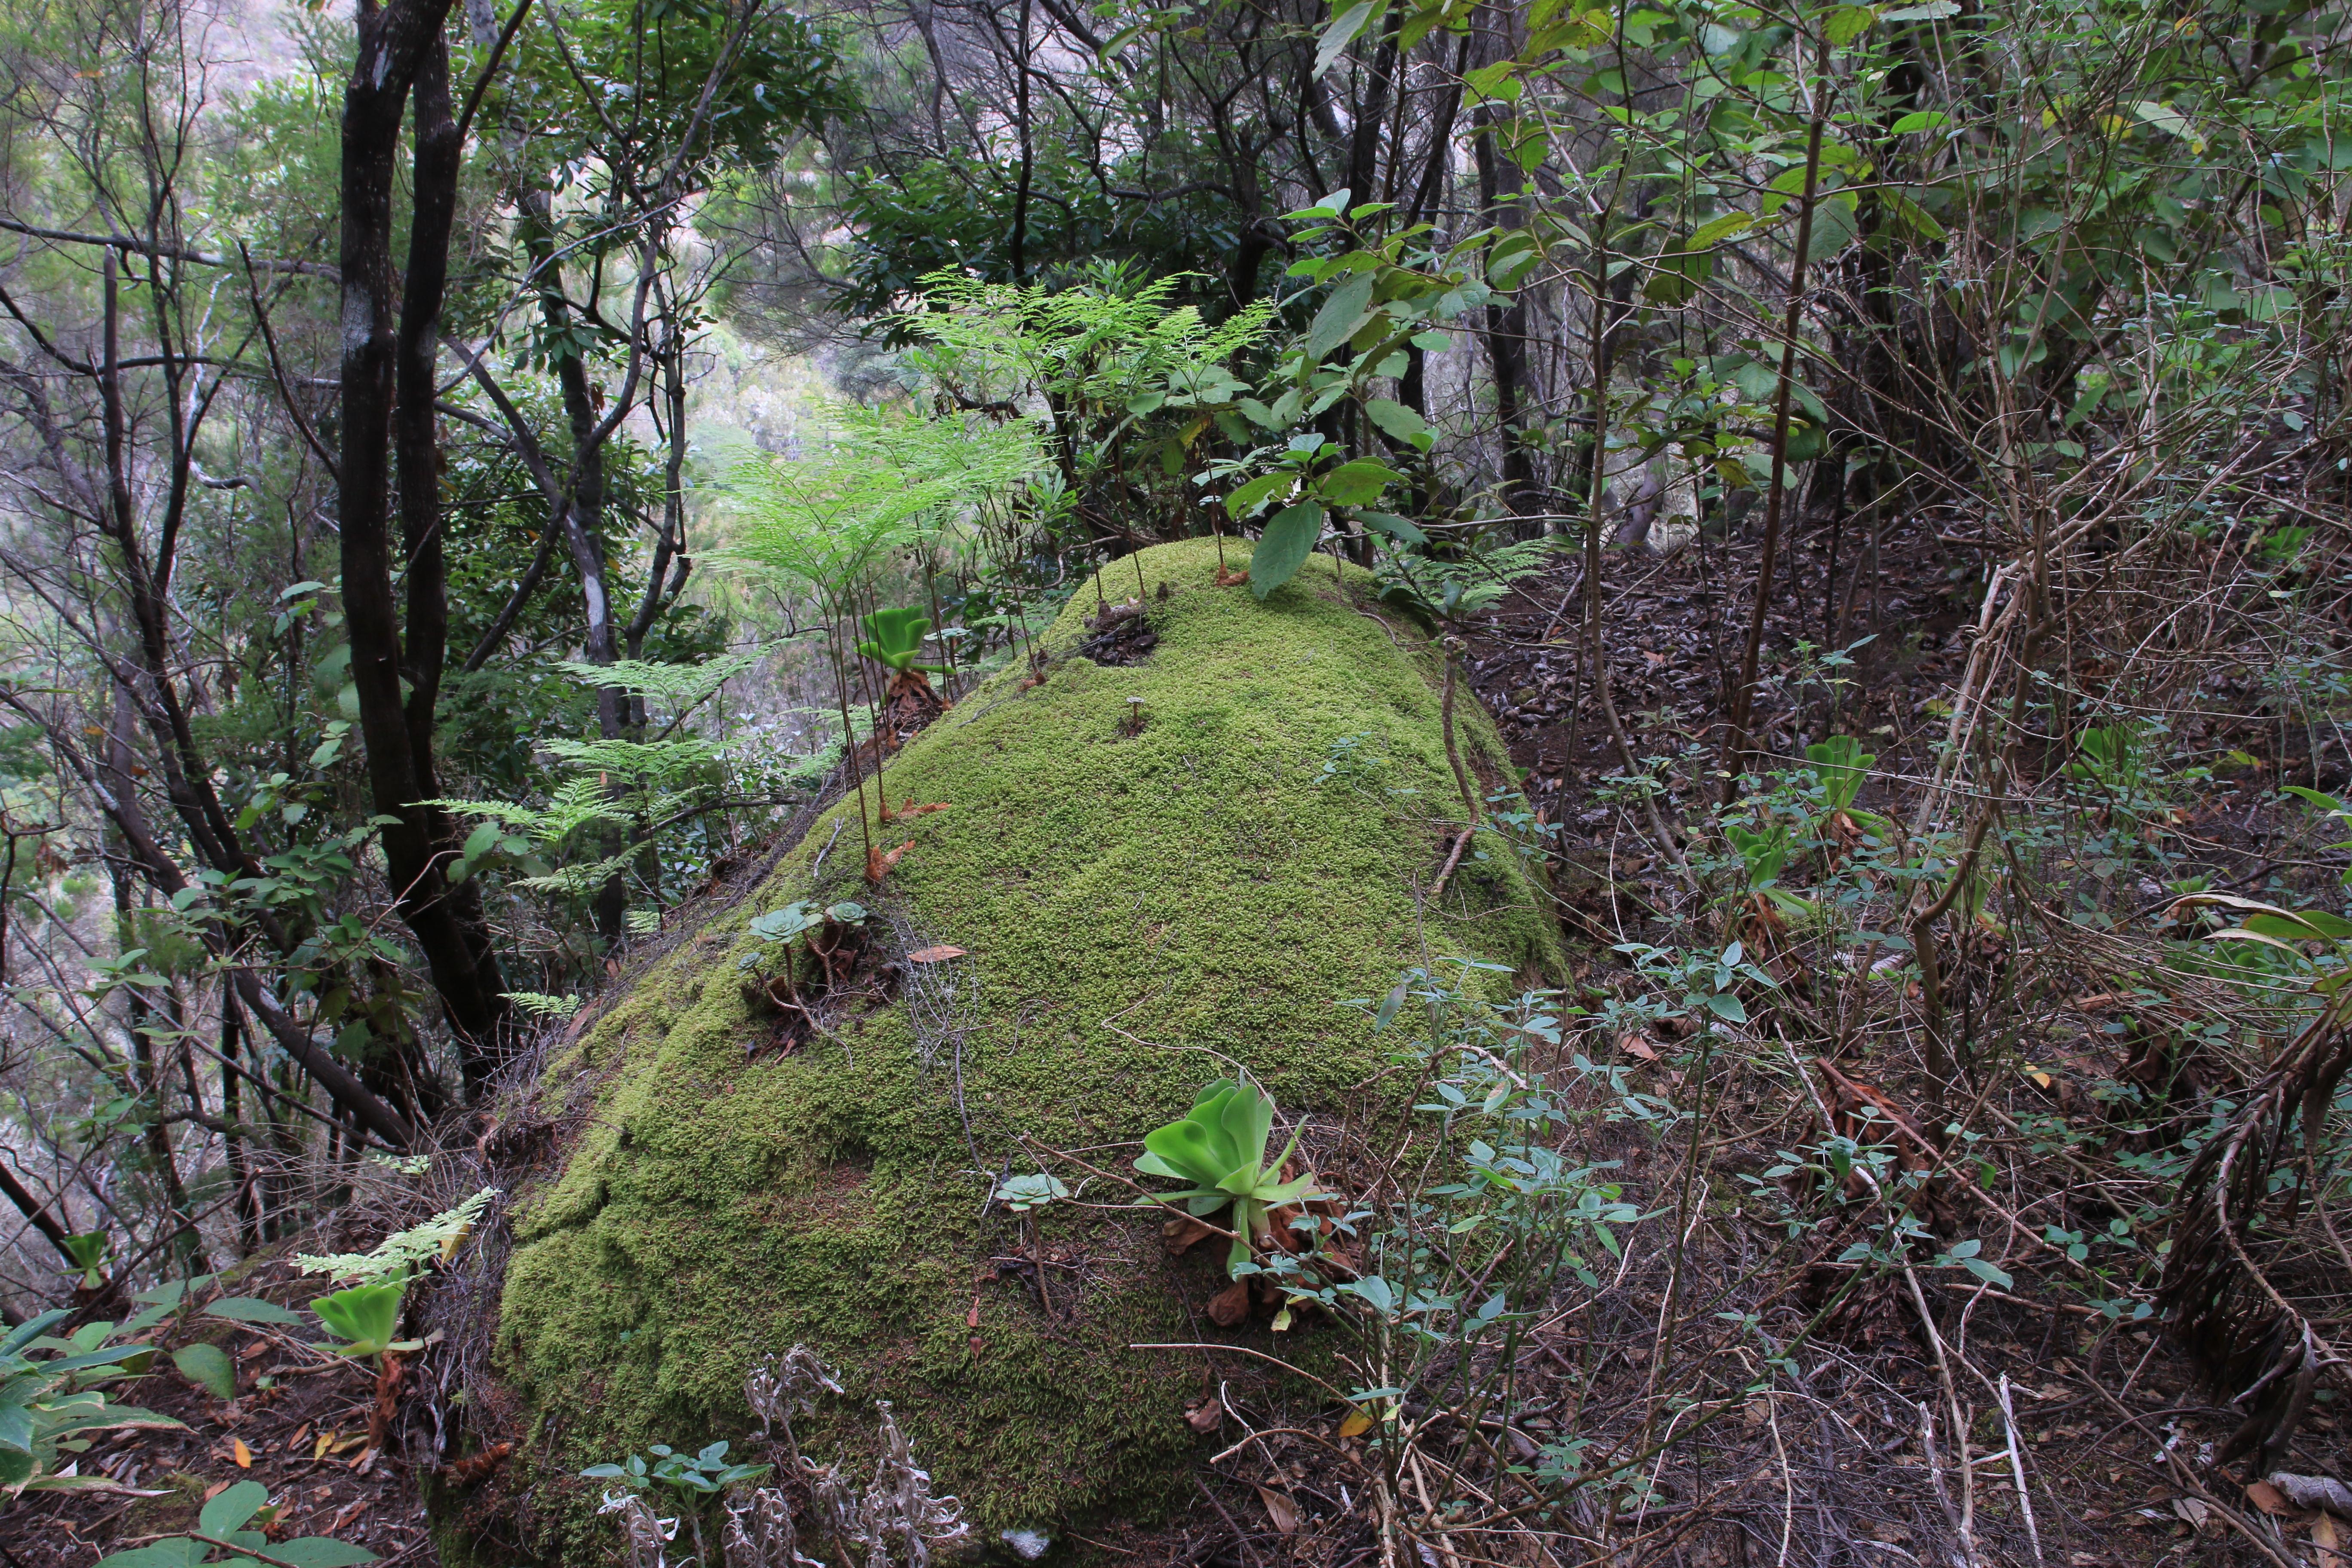 img_7508-davallia-a-10-habitat-1.jpg